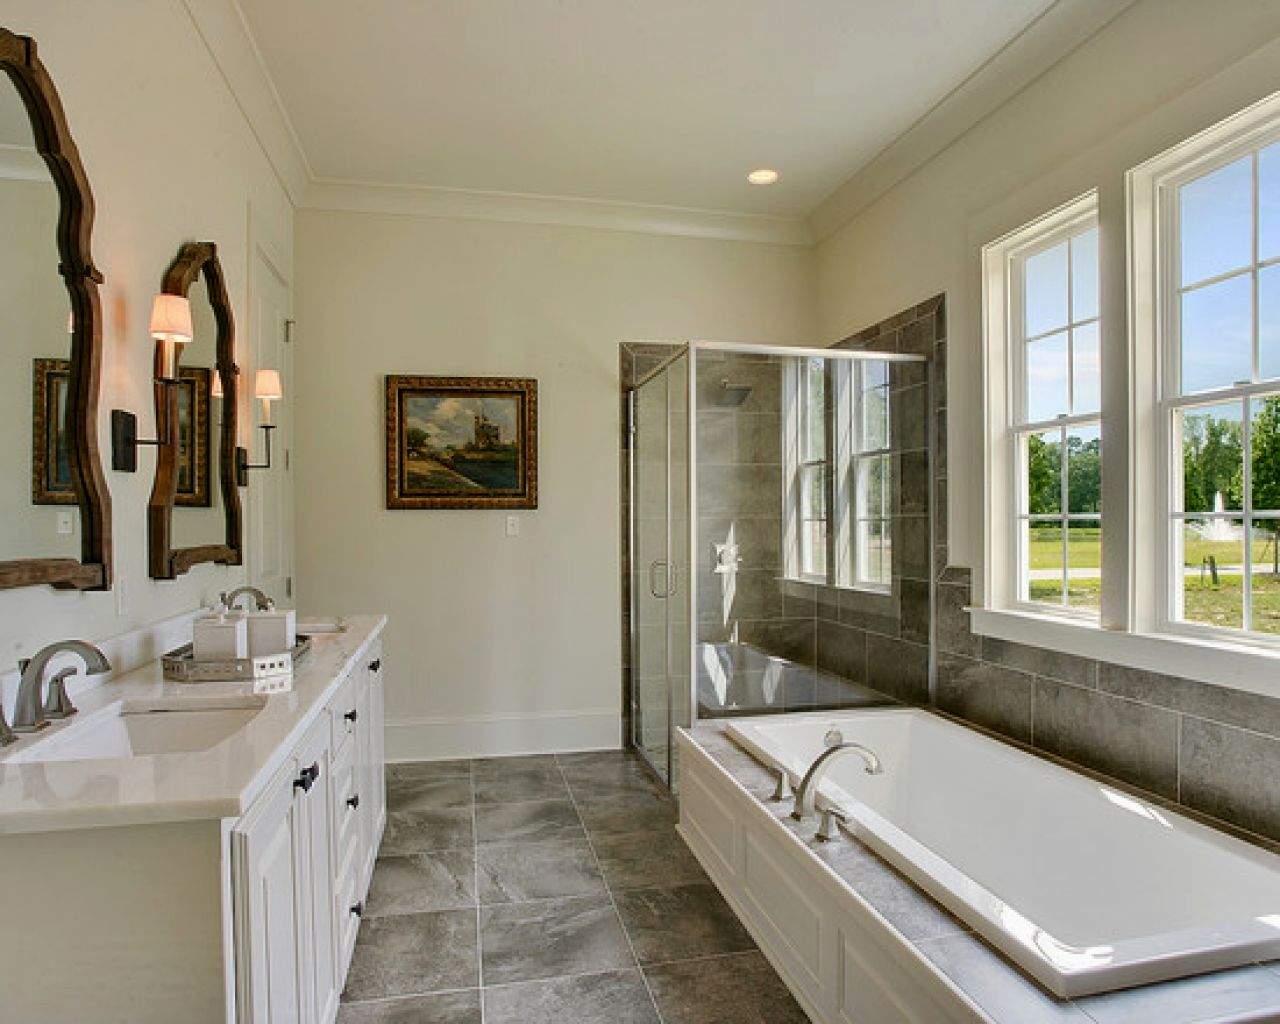 best of bathroom vanity decor construction-Inspirational Bathroom Vanity Decor Model